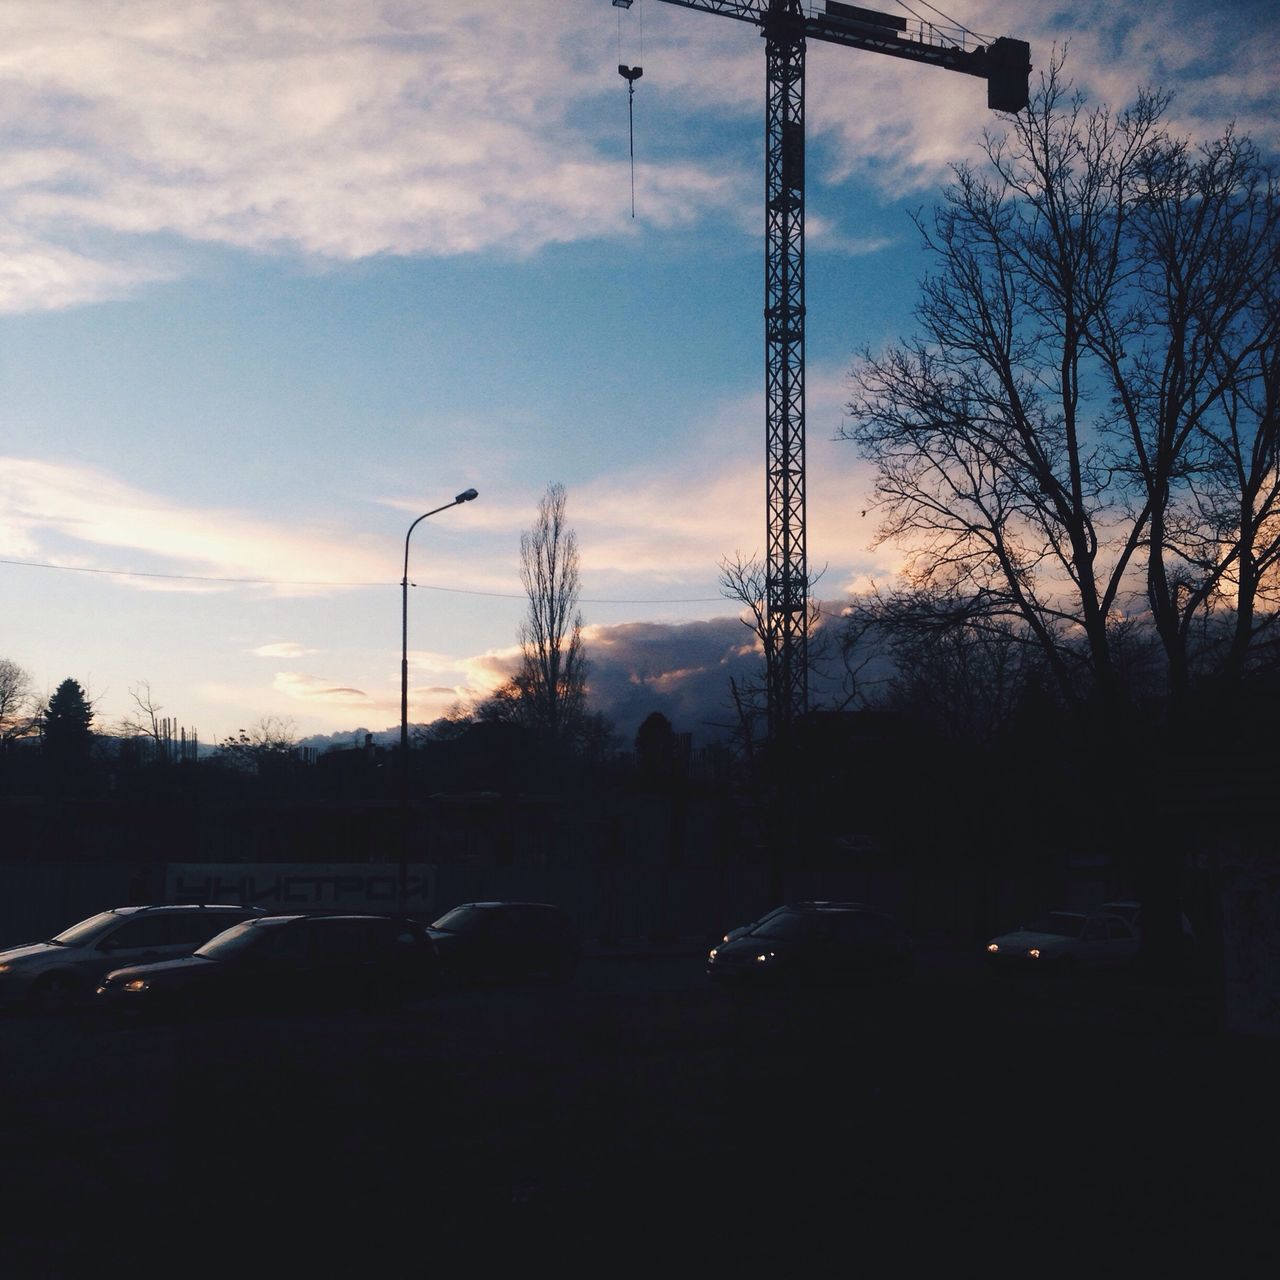 car, transportation, land vehicle, tree, sky, bare tree, cloud - sky, silhouette, street light, no people, outdoors, day